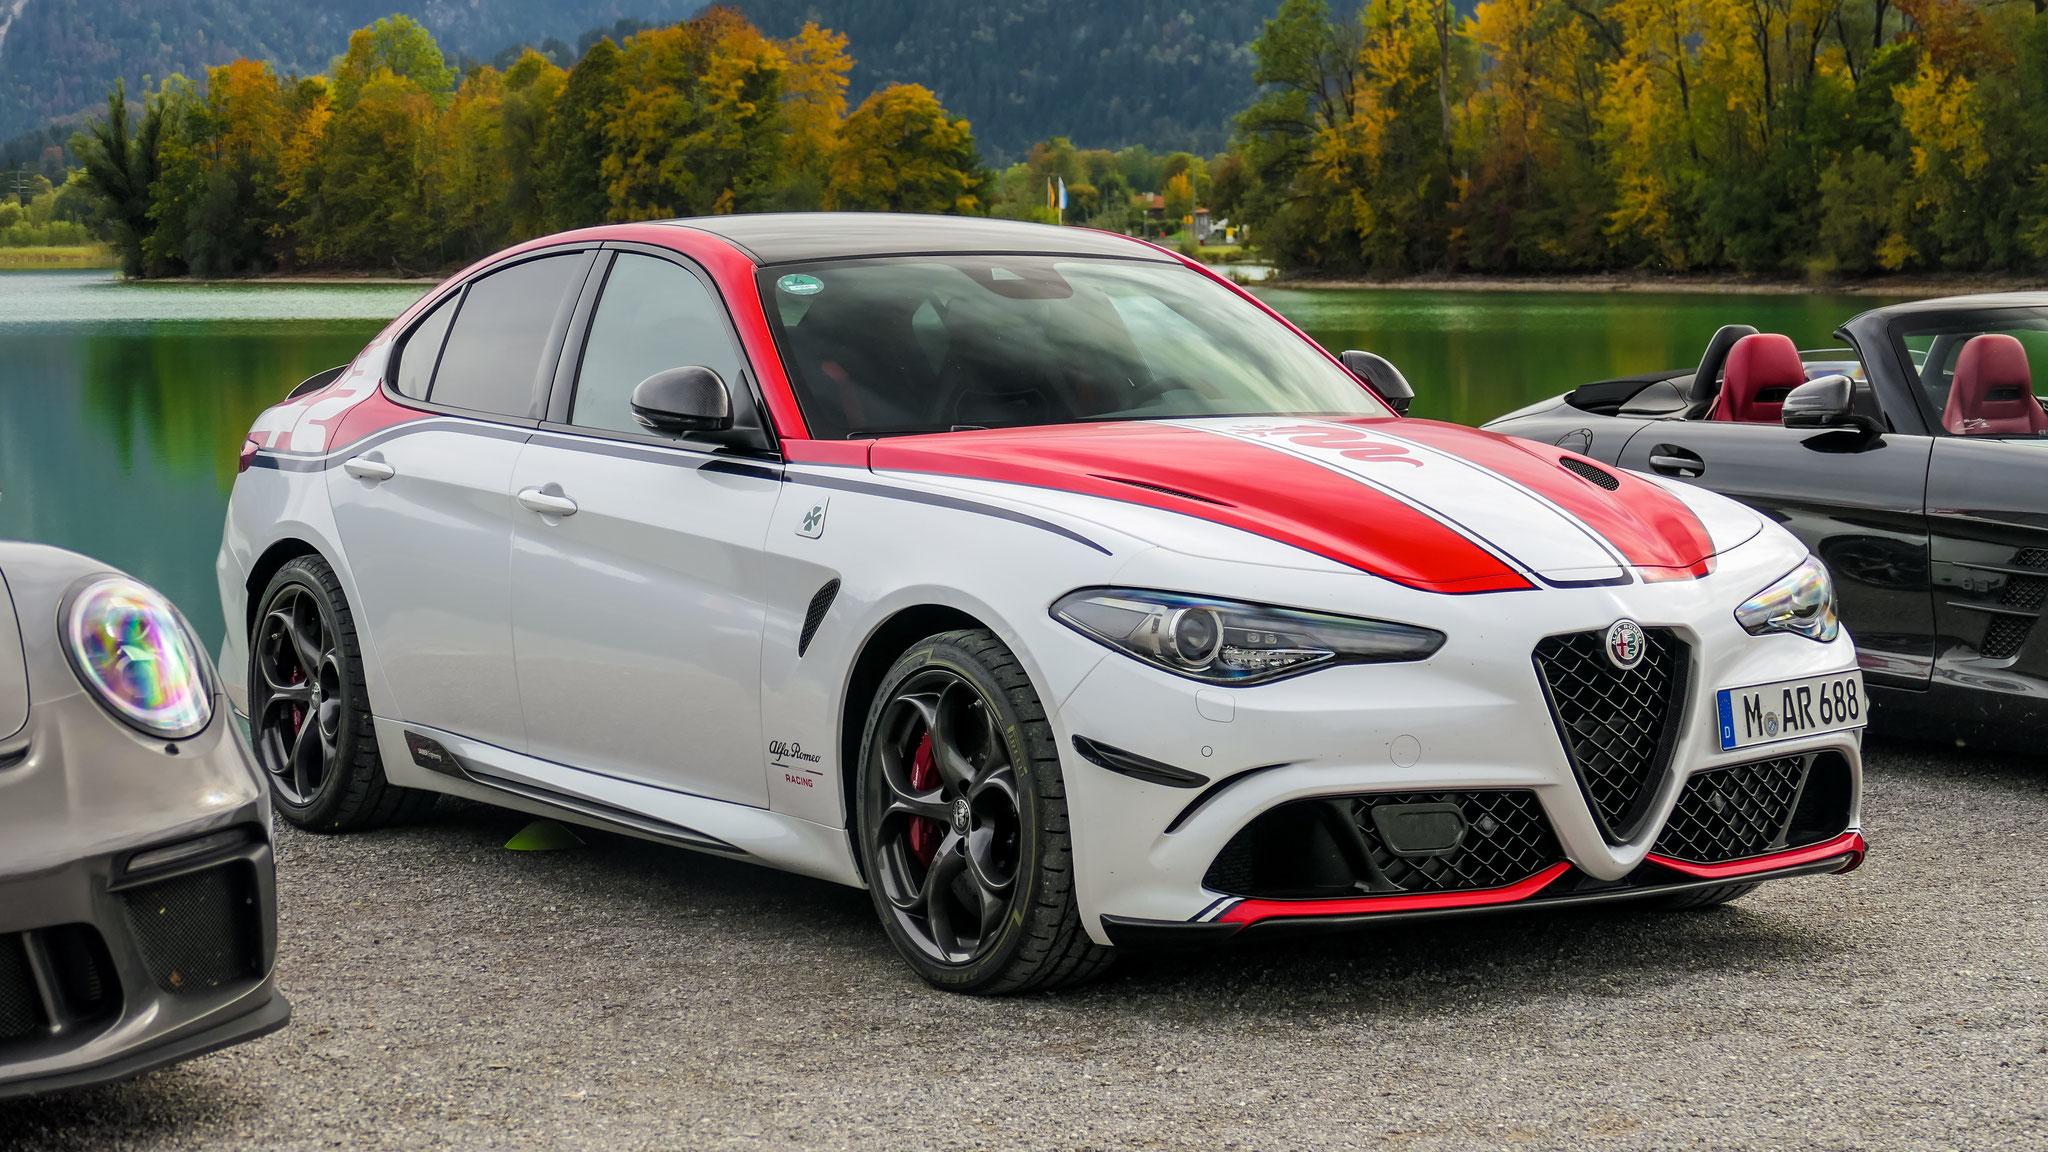 Alfa Romeo Giulia Racing Edition - M-AR-688